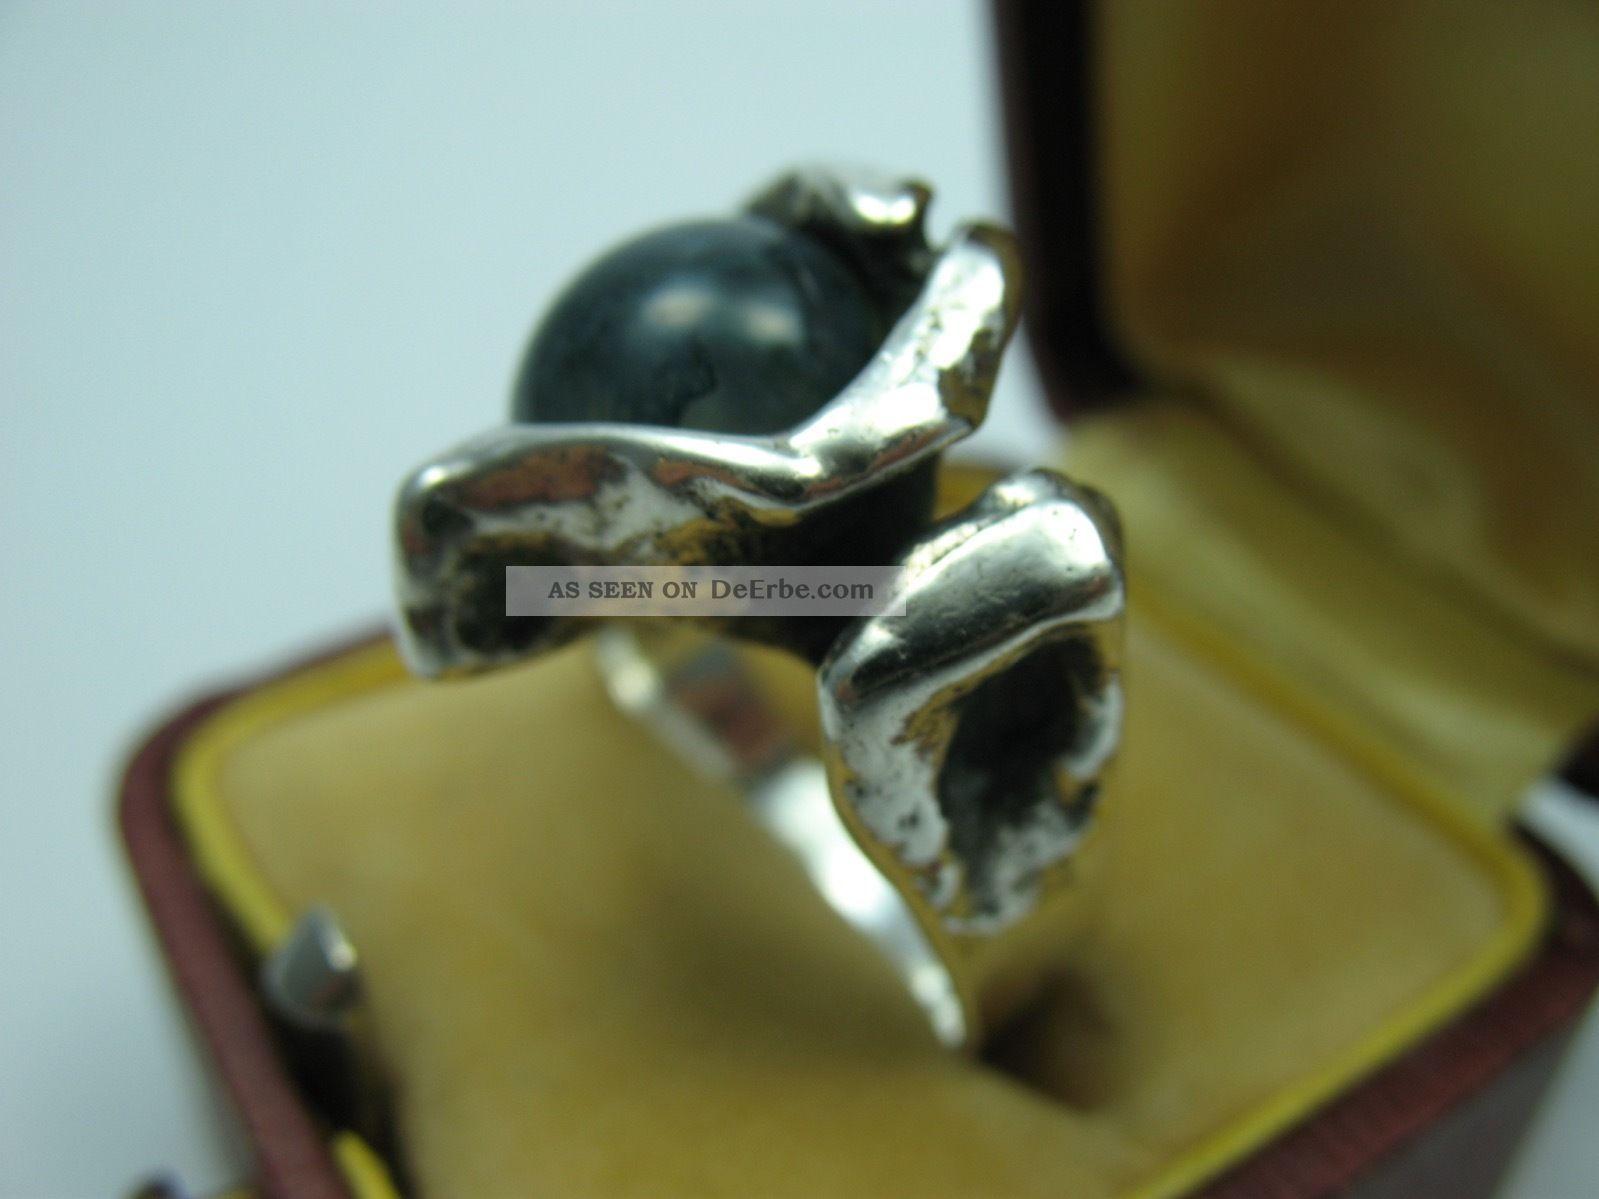 Burkhard Und Monika Oly Top Moosachat Vintage Modernist Designer Ring 835 Silber Ringe Bild